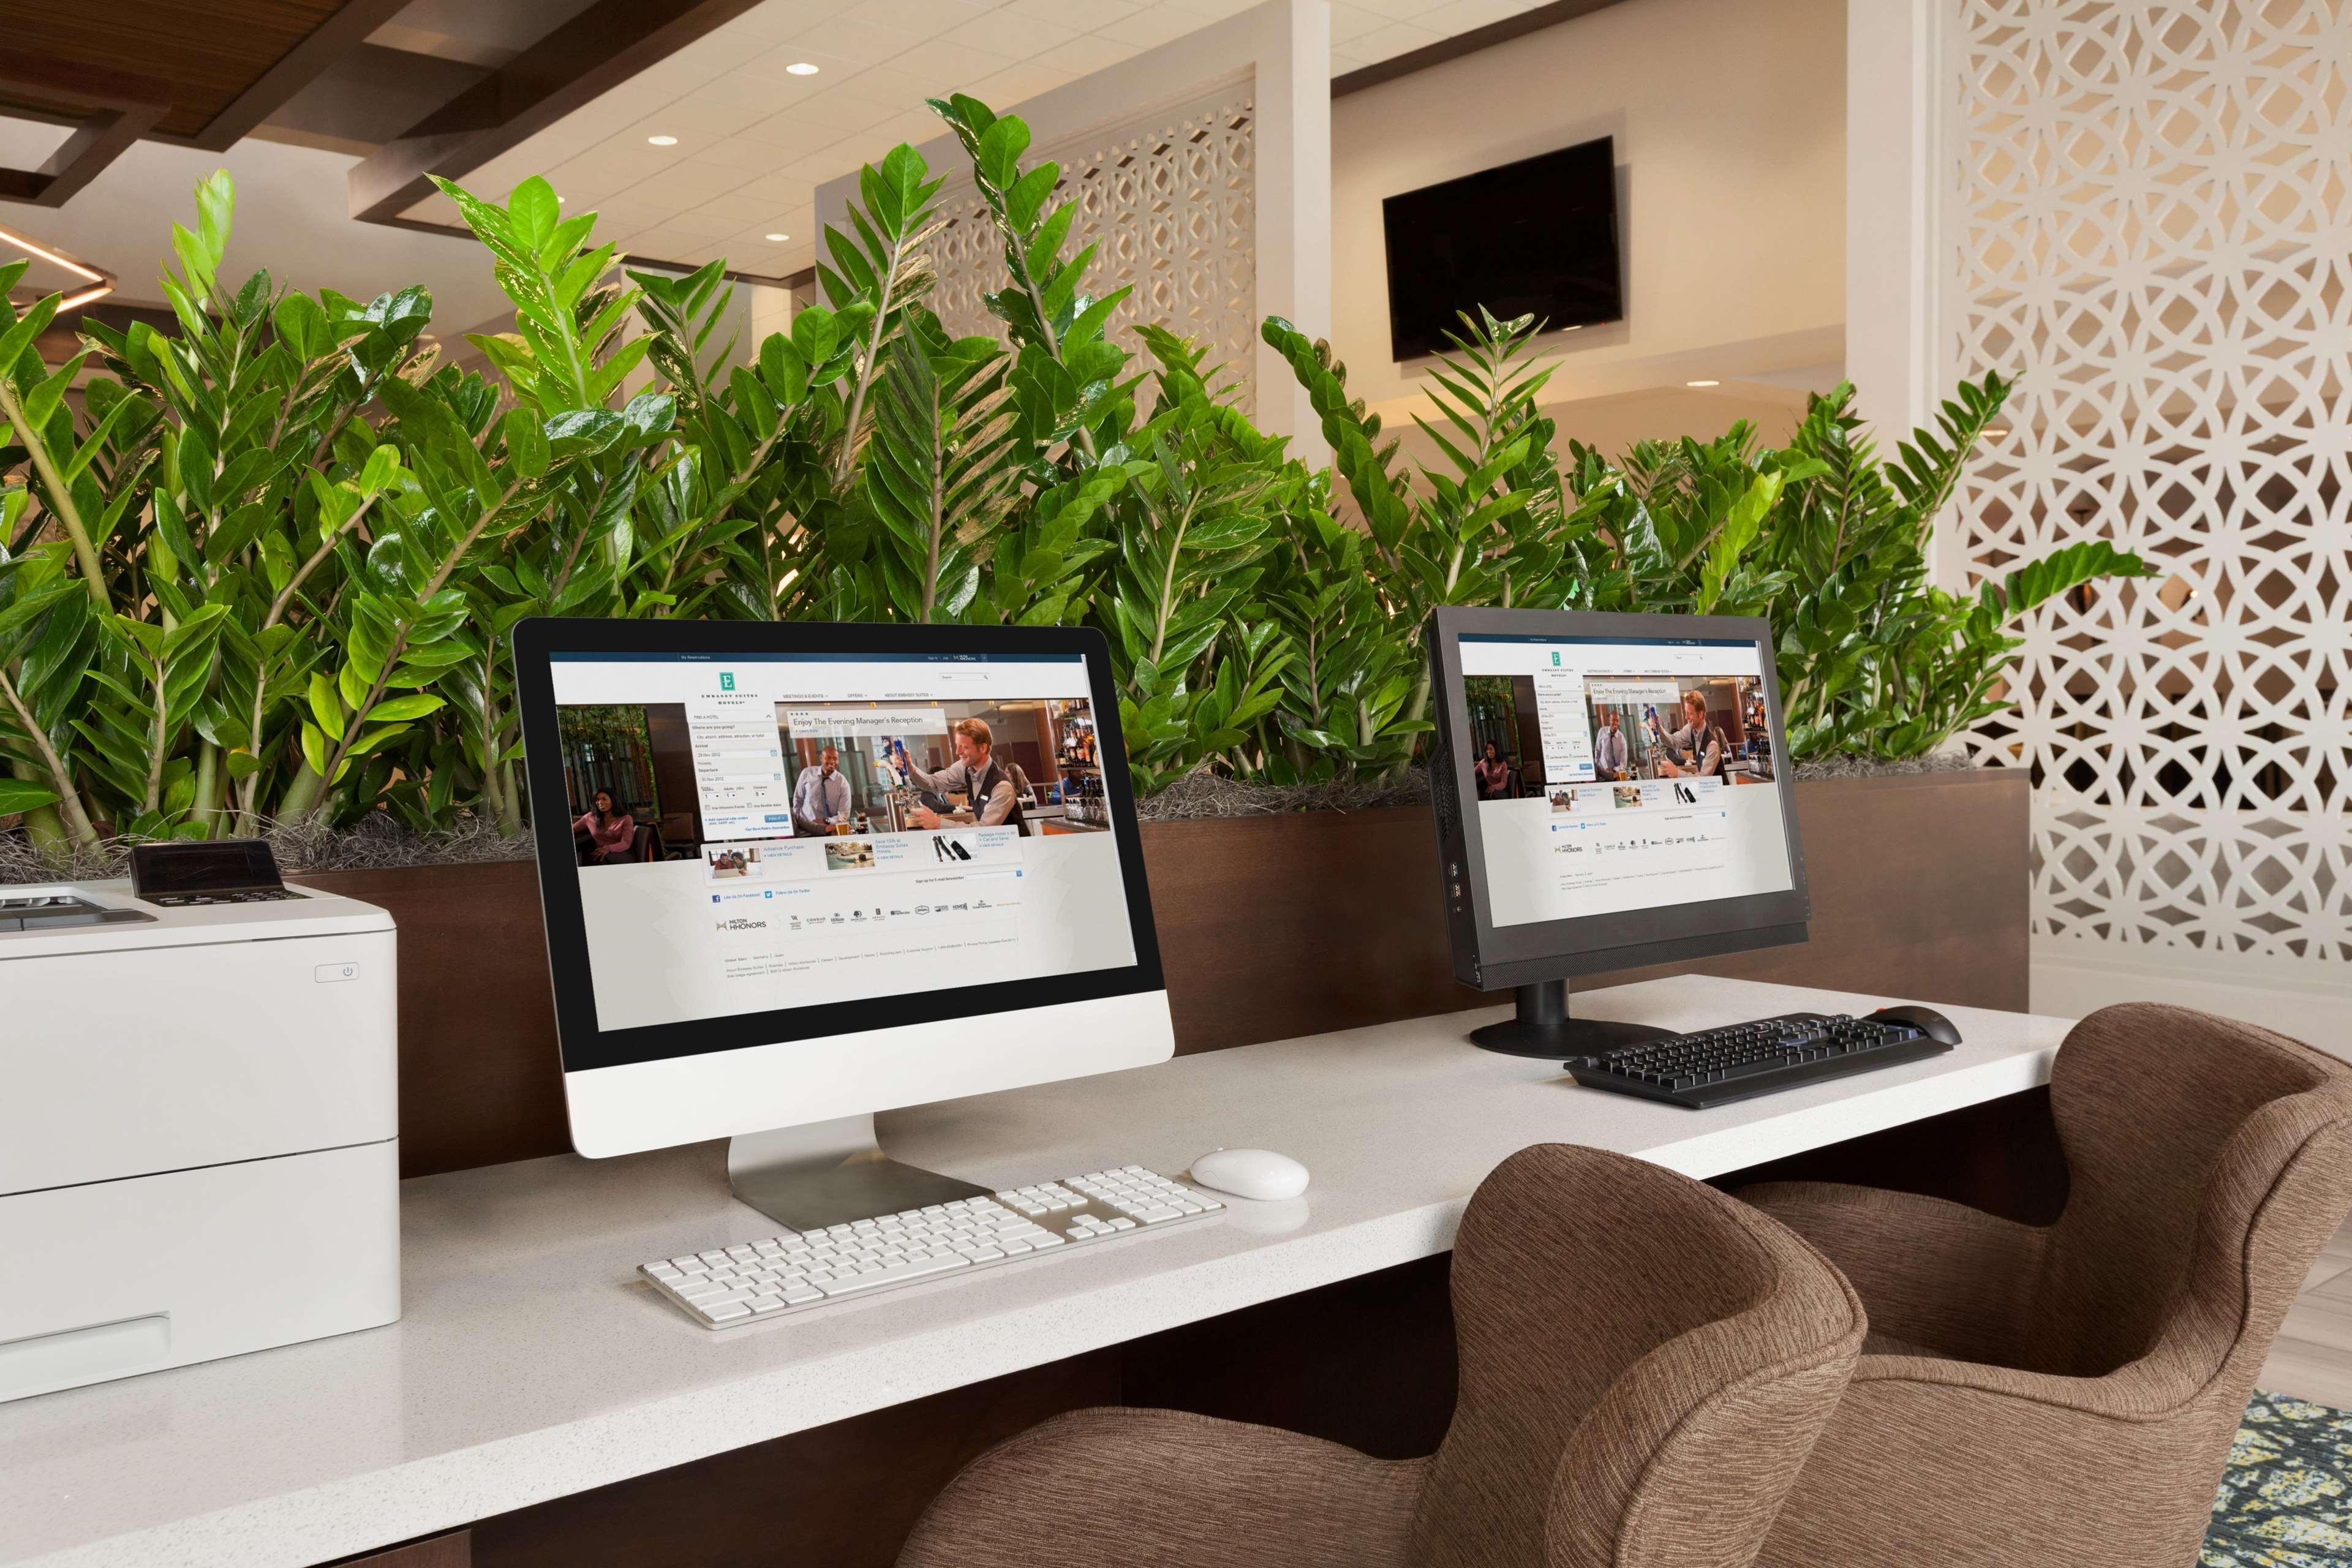 Embassy Suites by Hilton San Antonio Brooks Hotel & Spa 7610